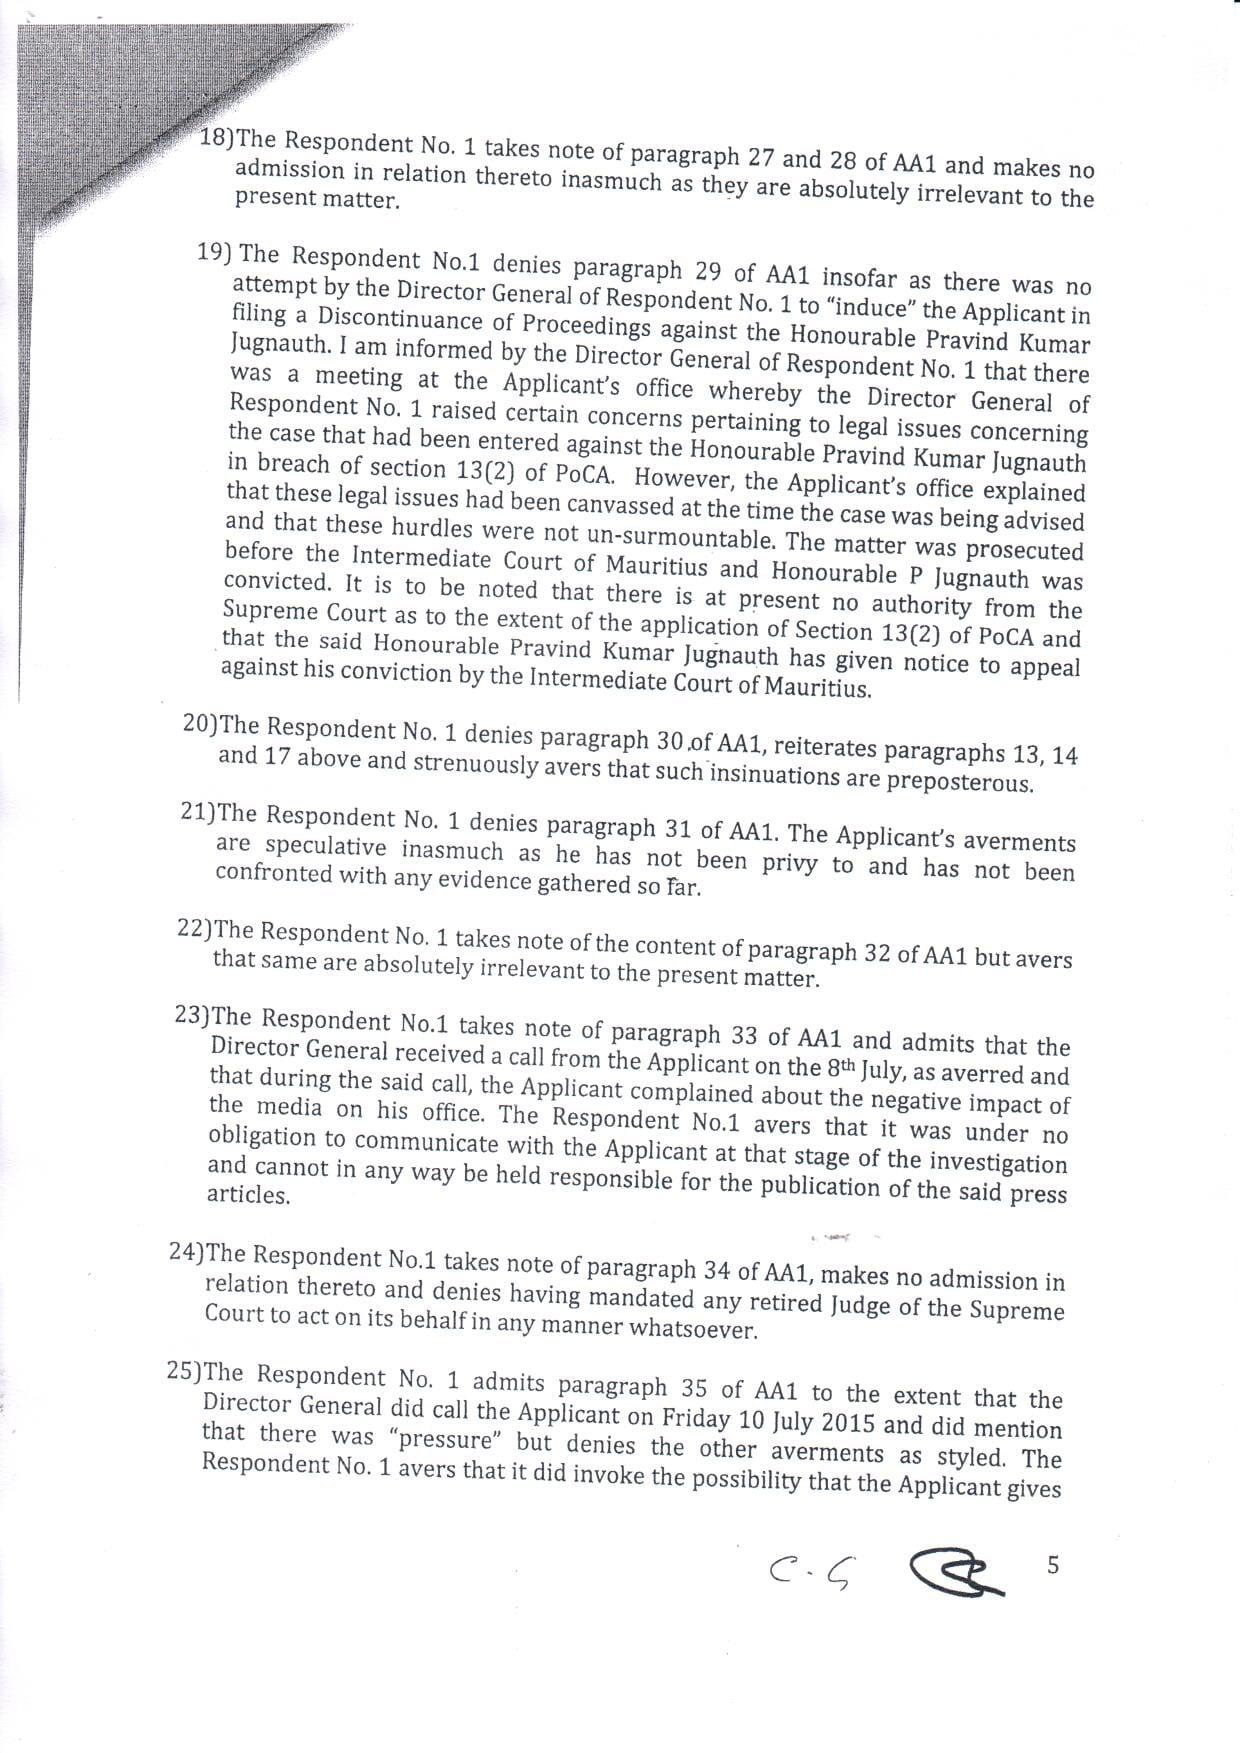 affidavit ICAC boolell 05